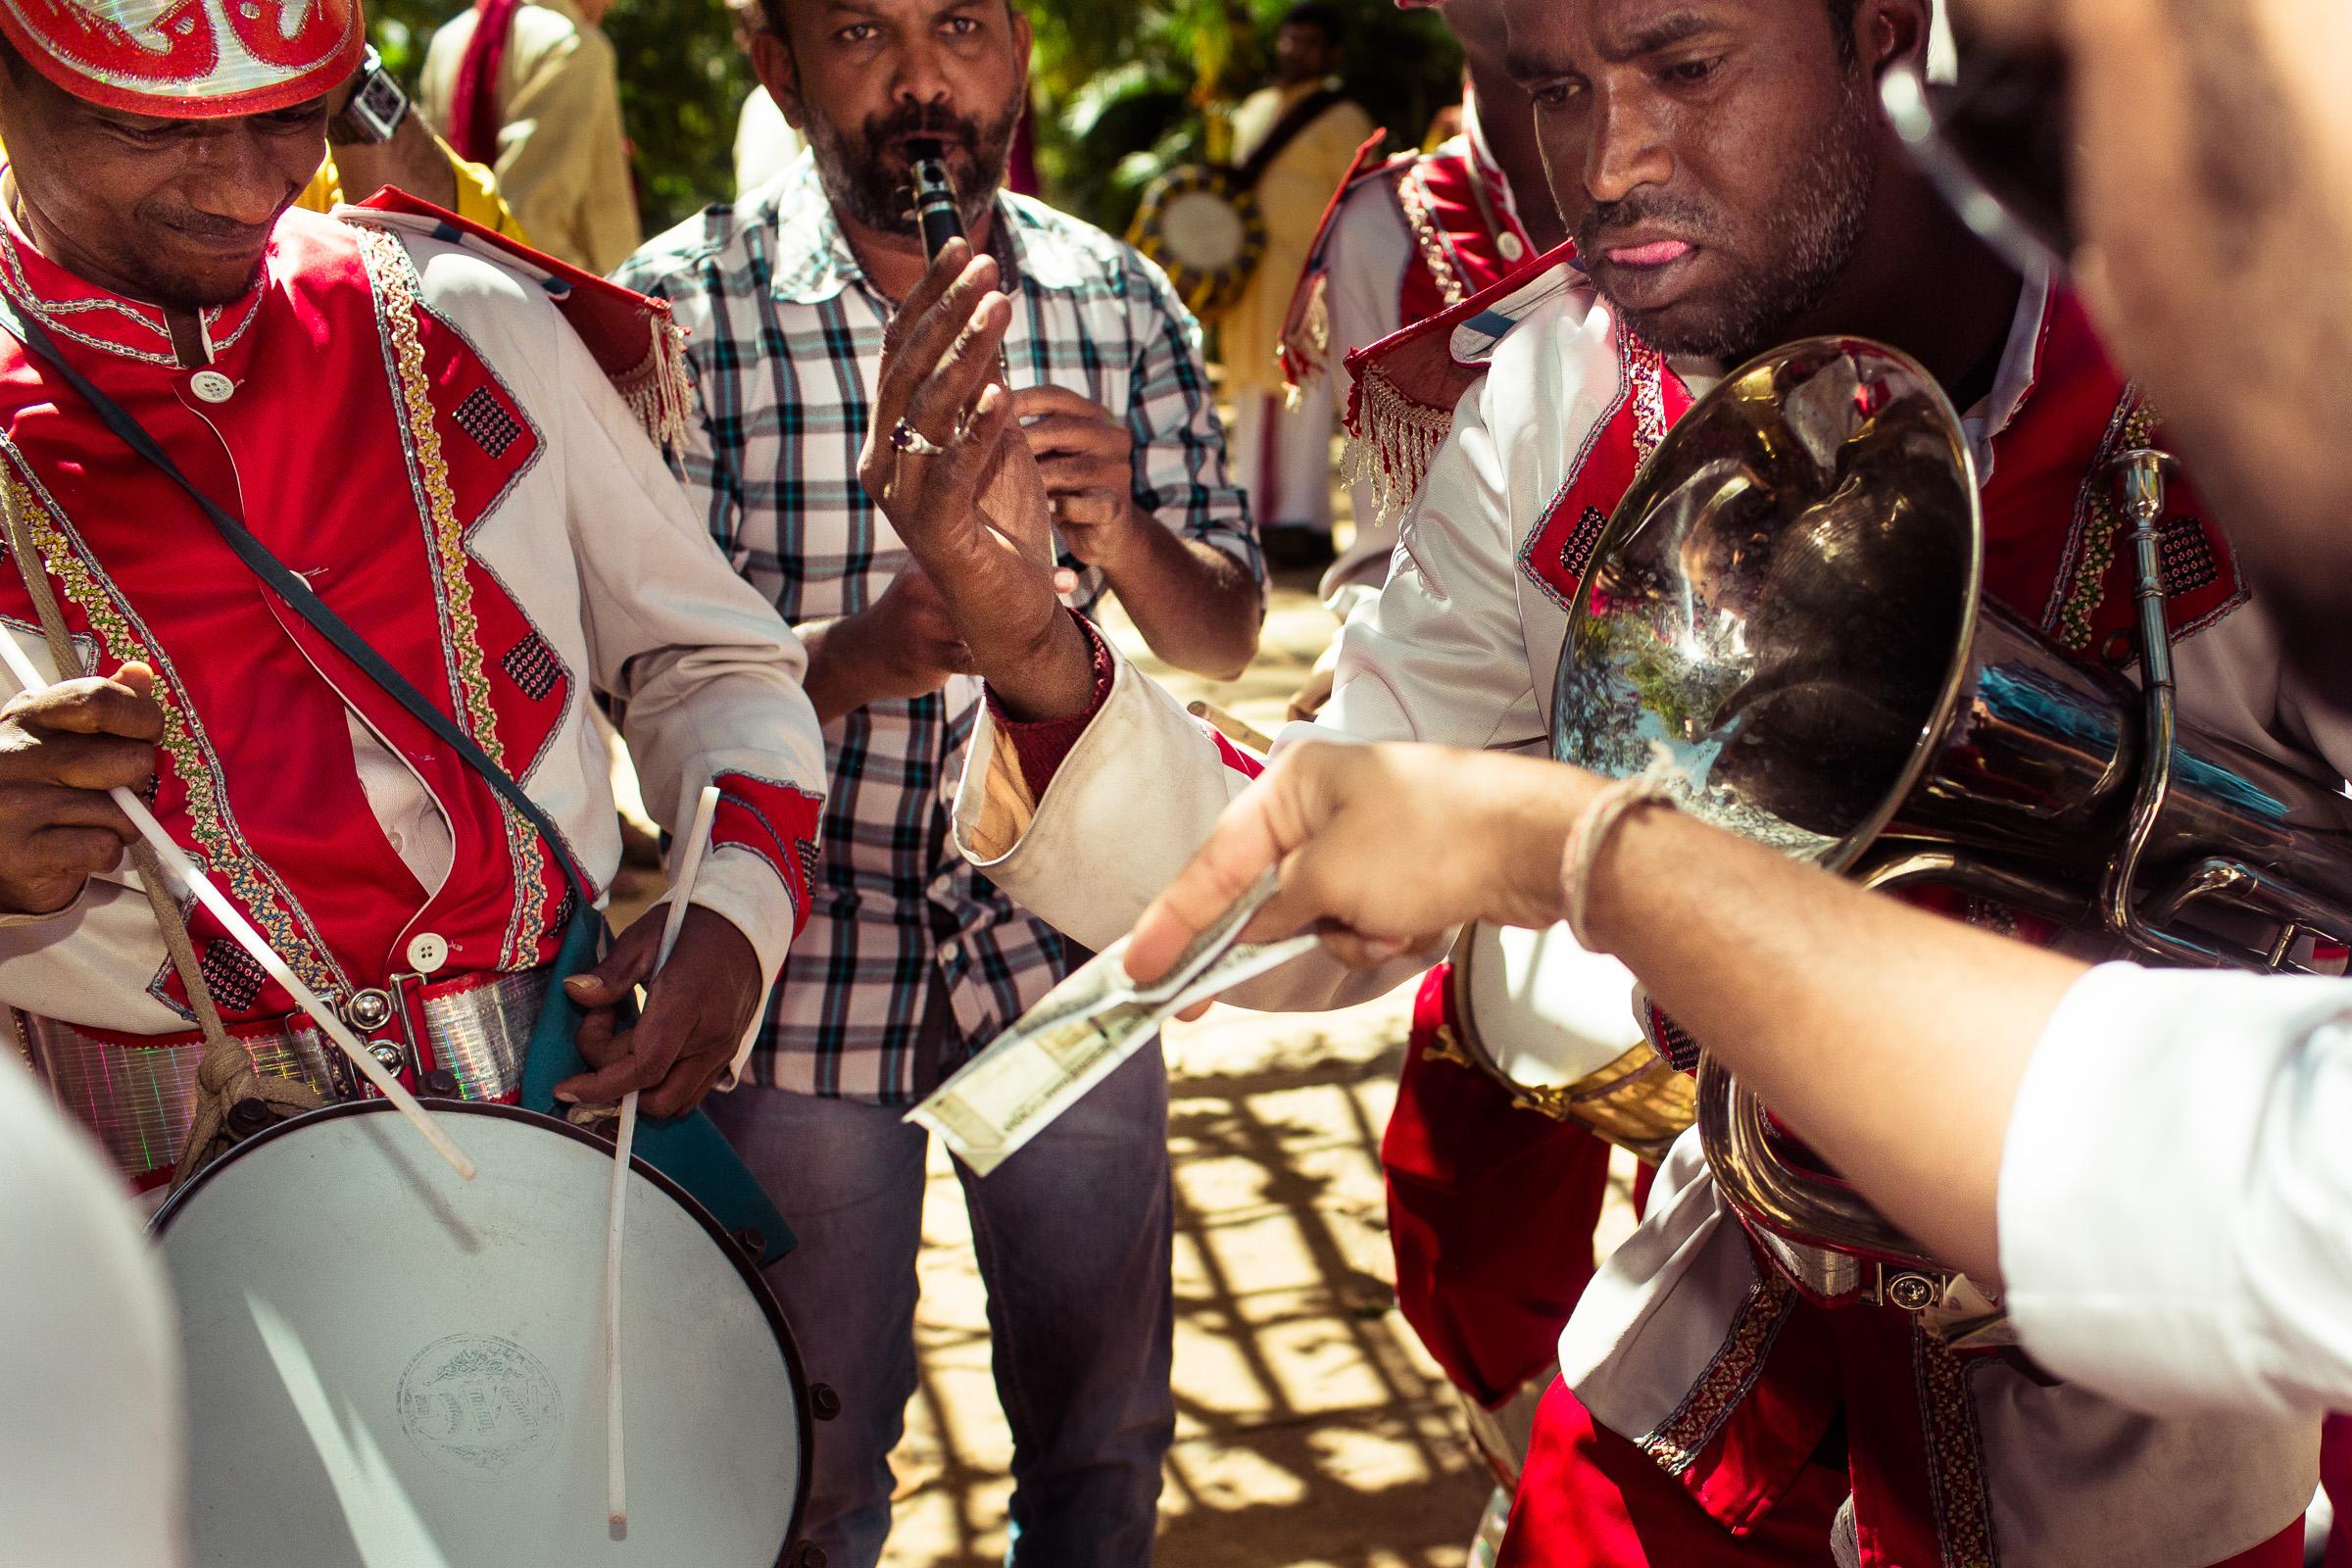 marwari-candid-wedding-photographers-bangalore-0023.jpg